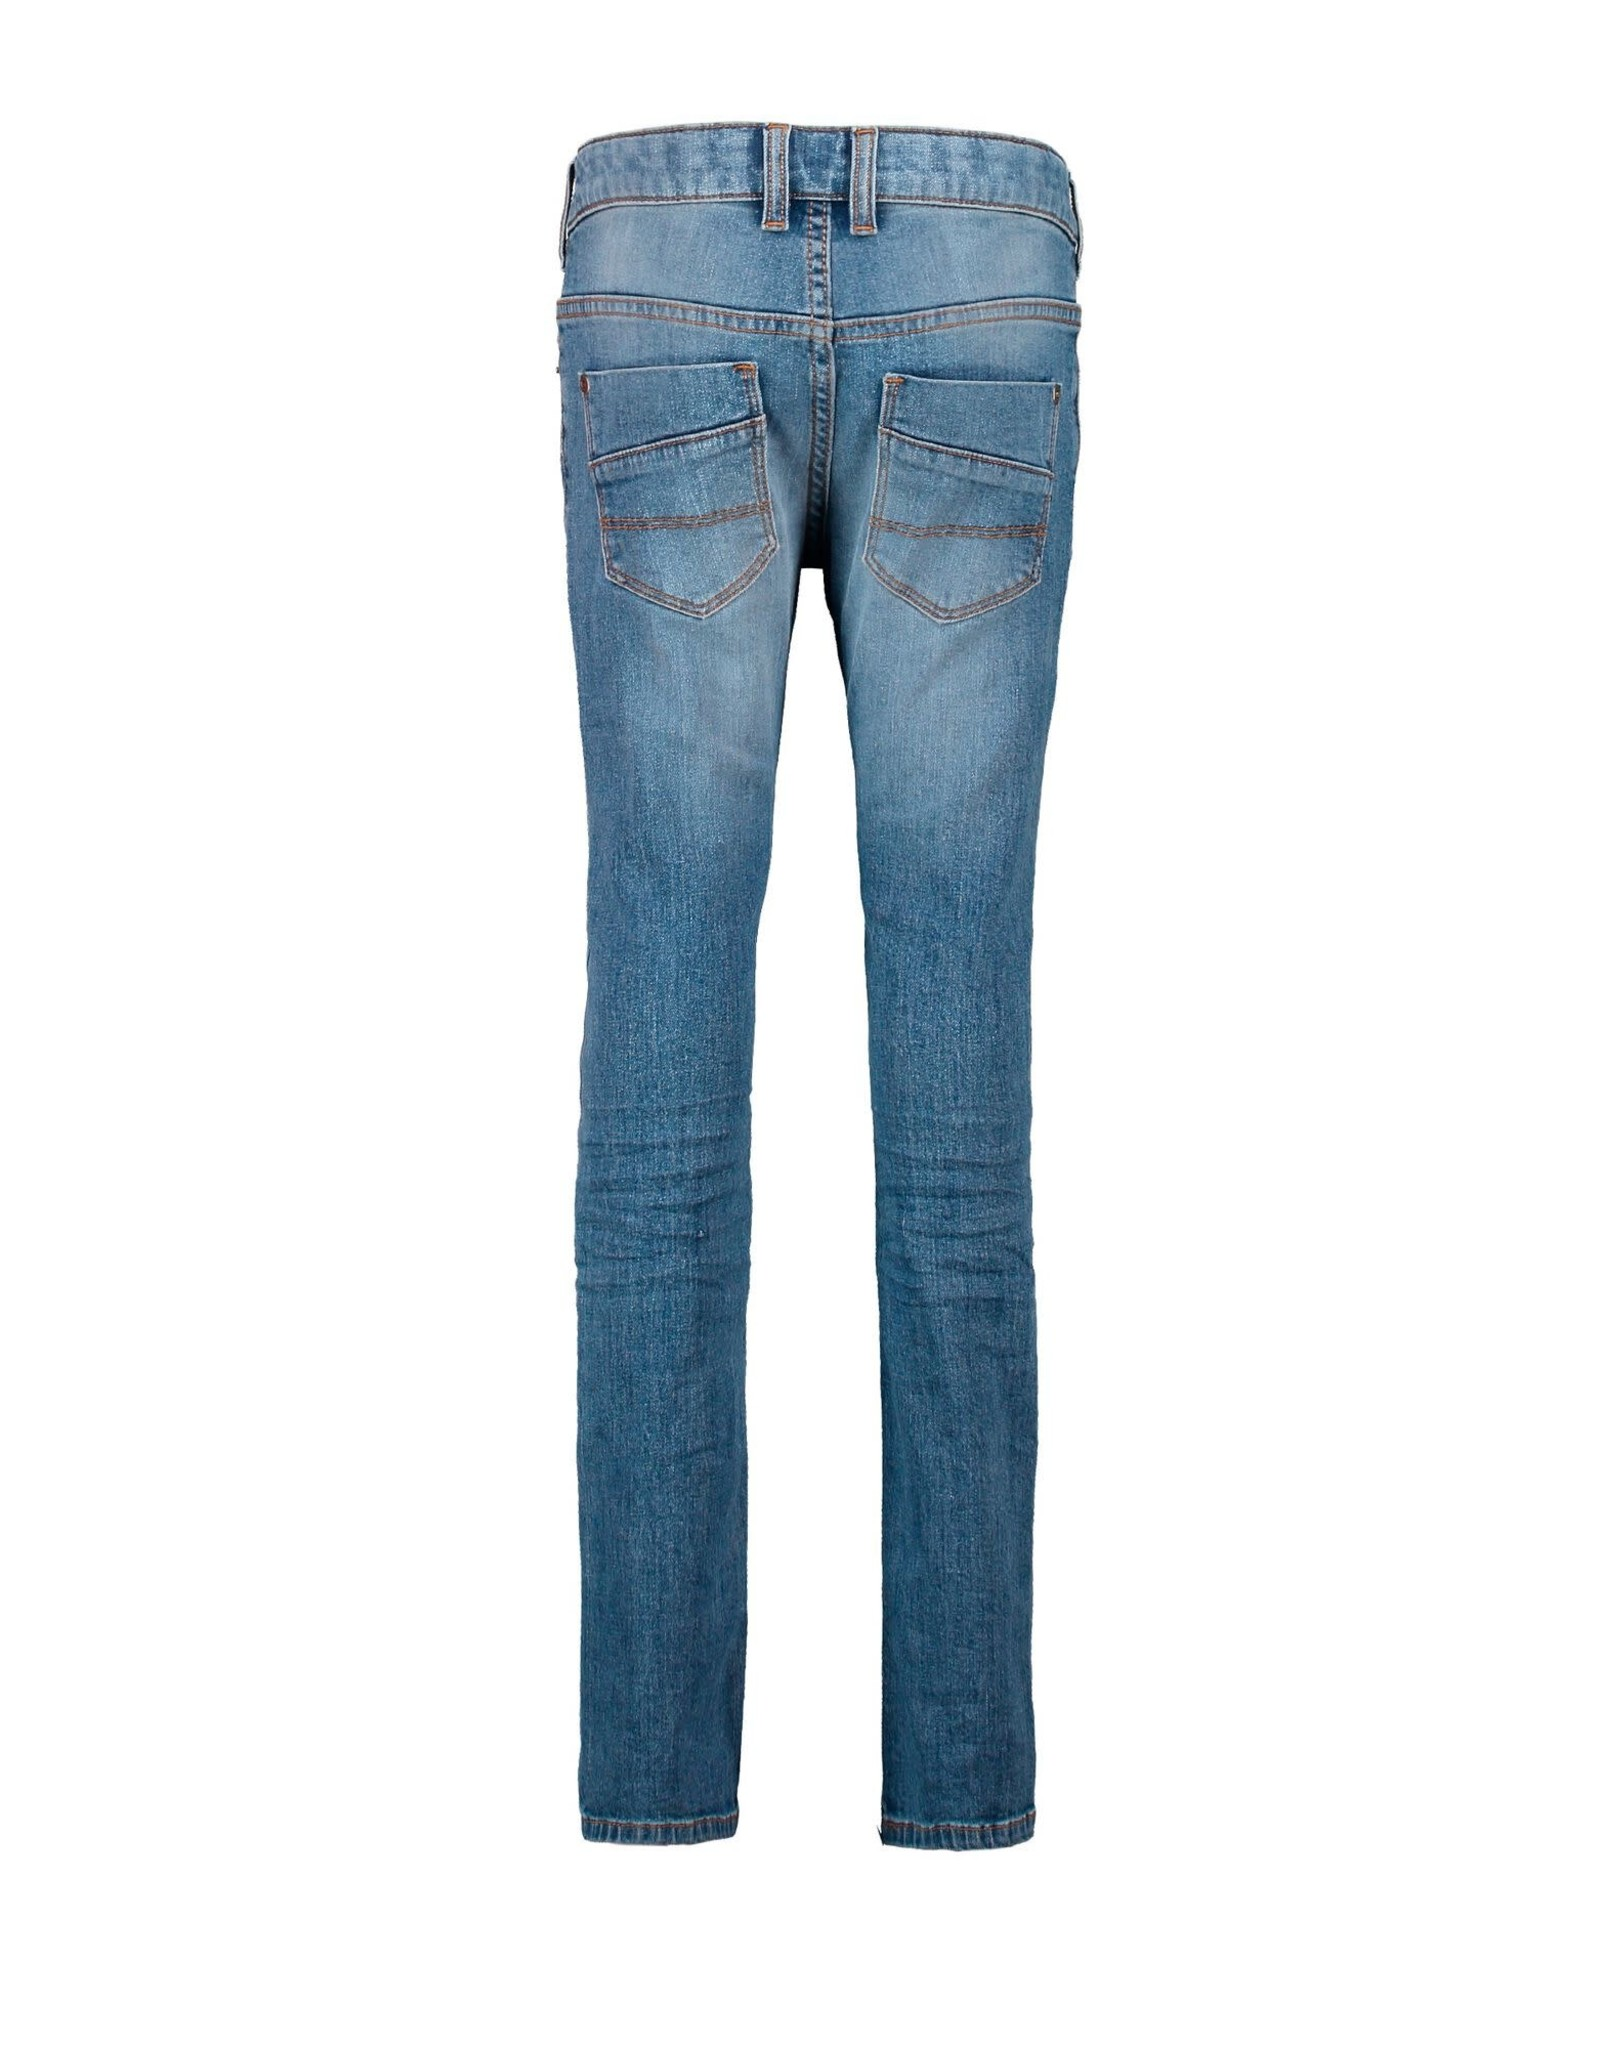 CKS skinvolume jeans